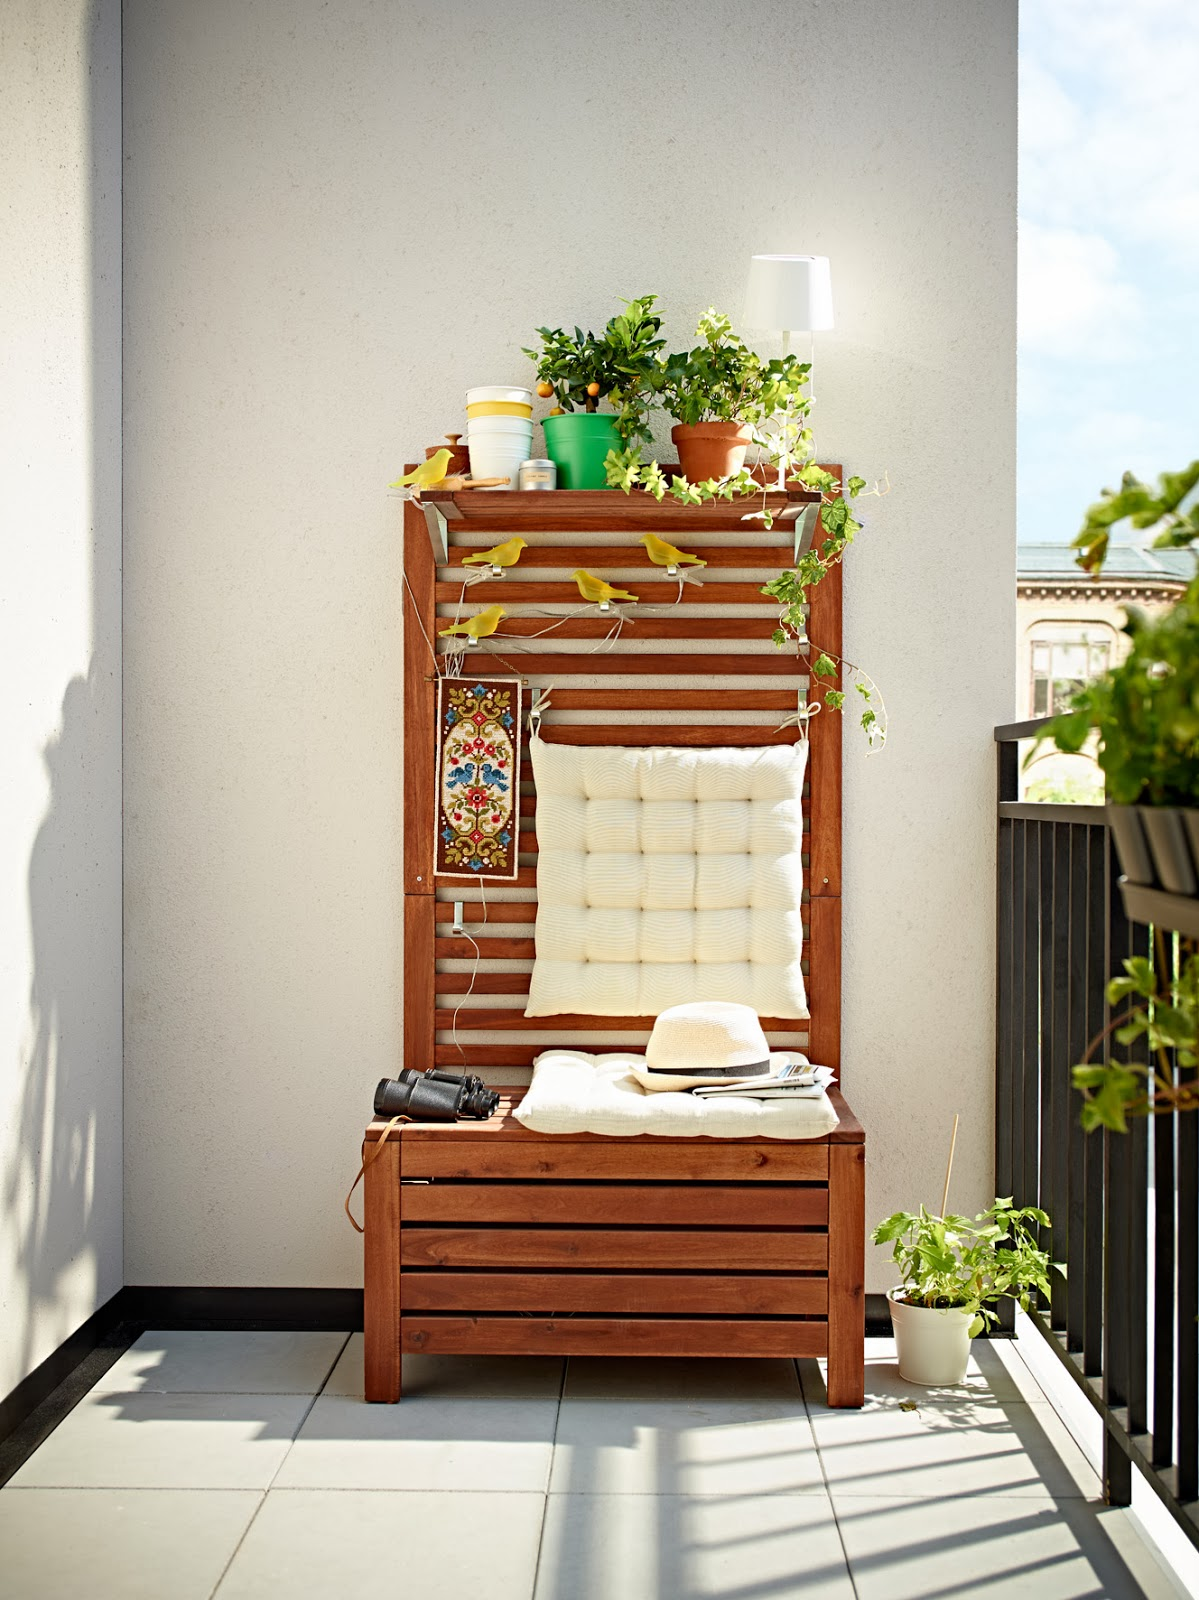 Bench for the balcony interior design ideas - ofdesign.